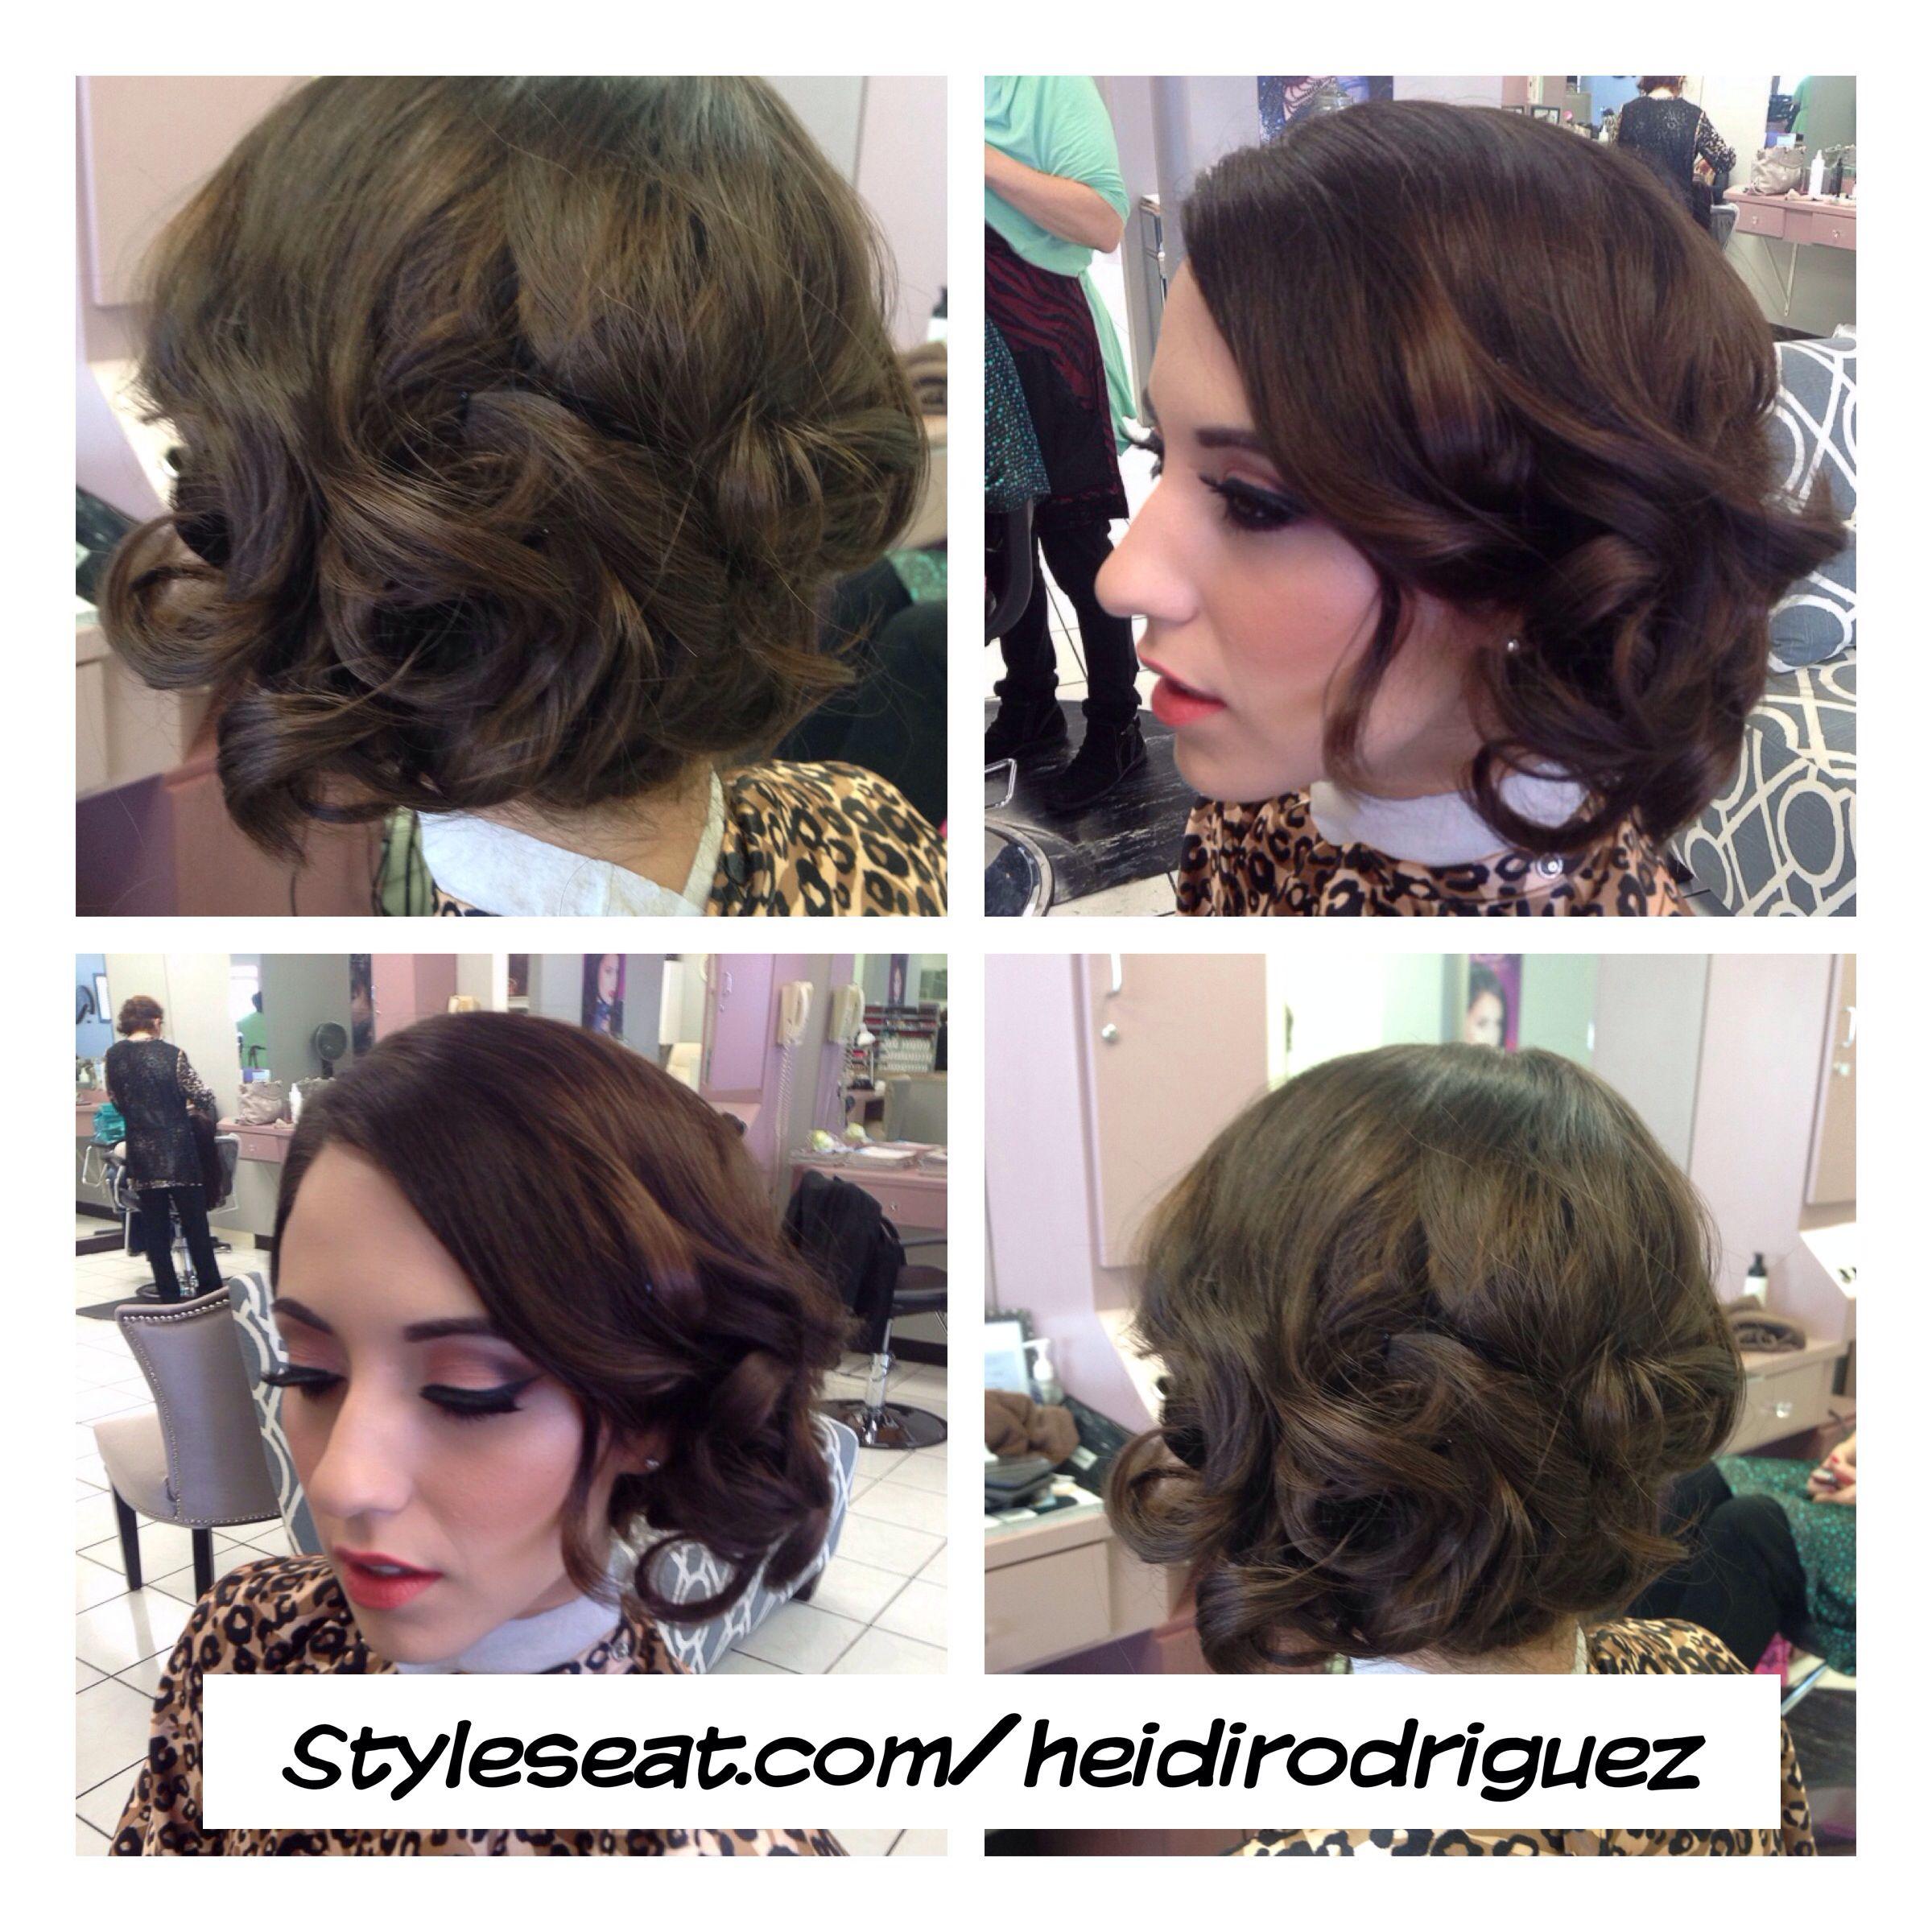 Hair By Heidi Rodriguez At Split Ends Salon Bakersfield Ca Hair